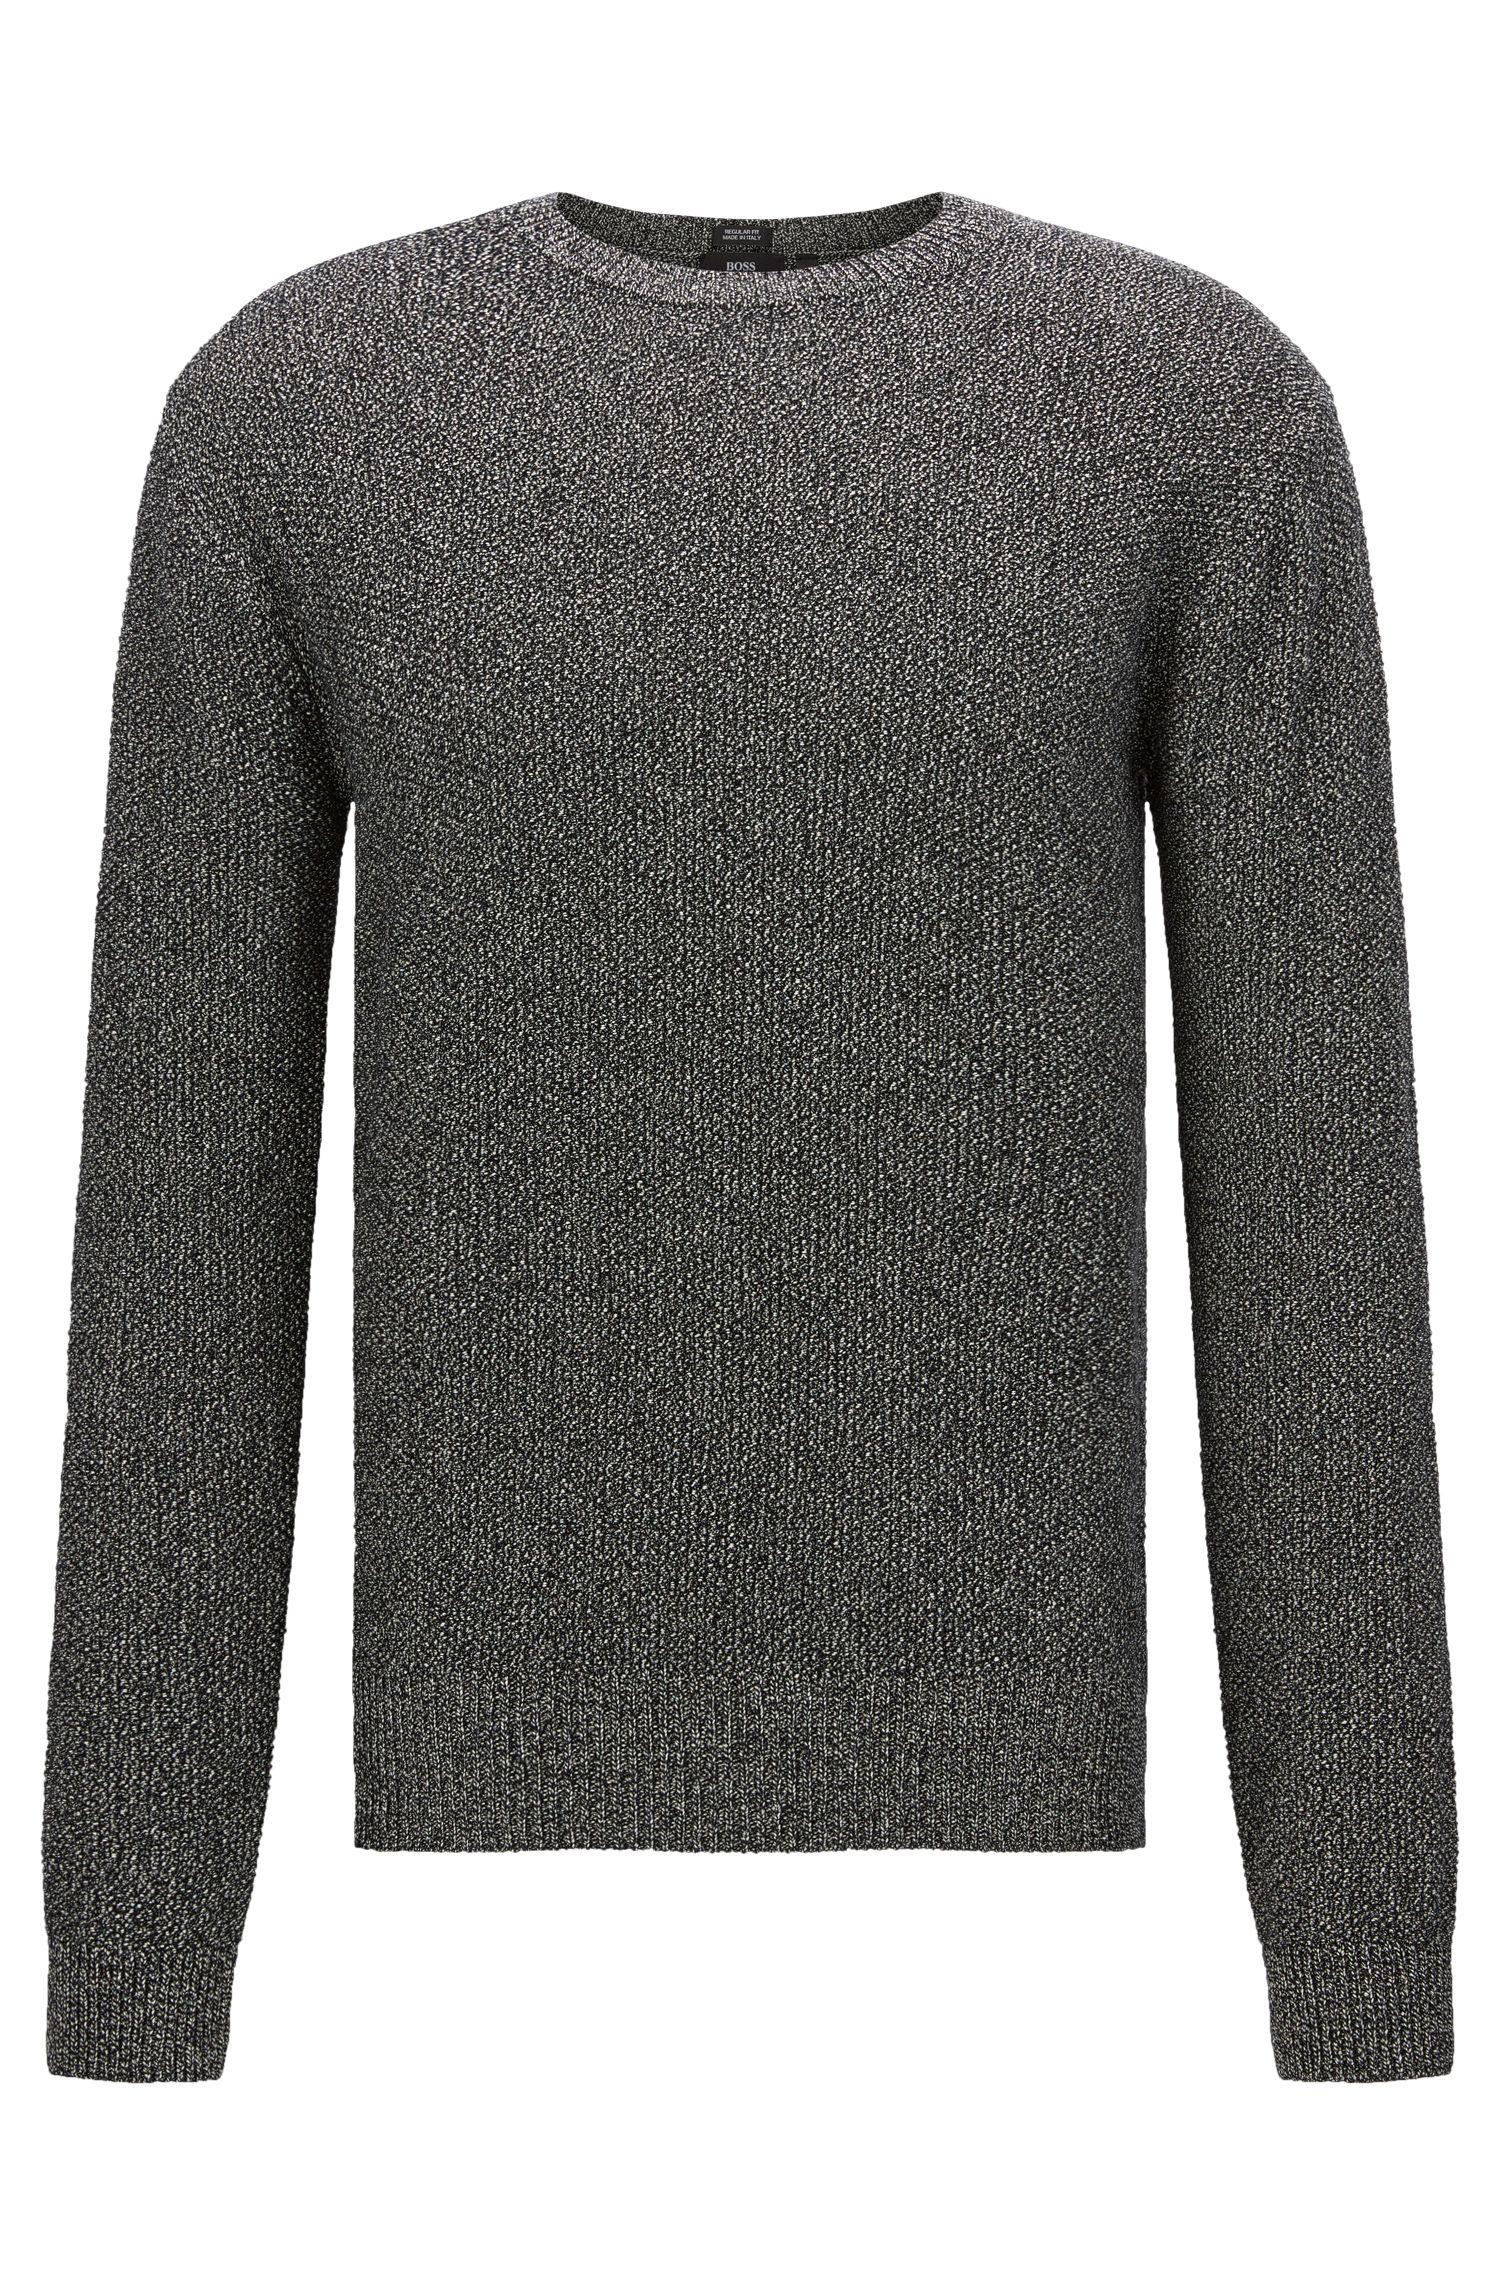 Gemêleerde regular-fit trui van katoen: 'Orsino'